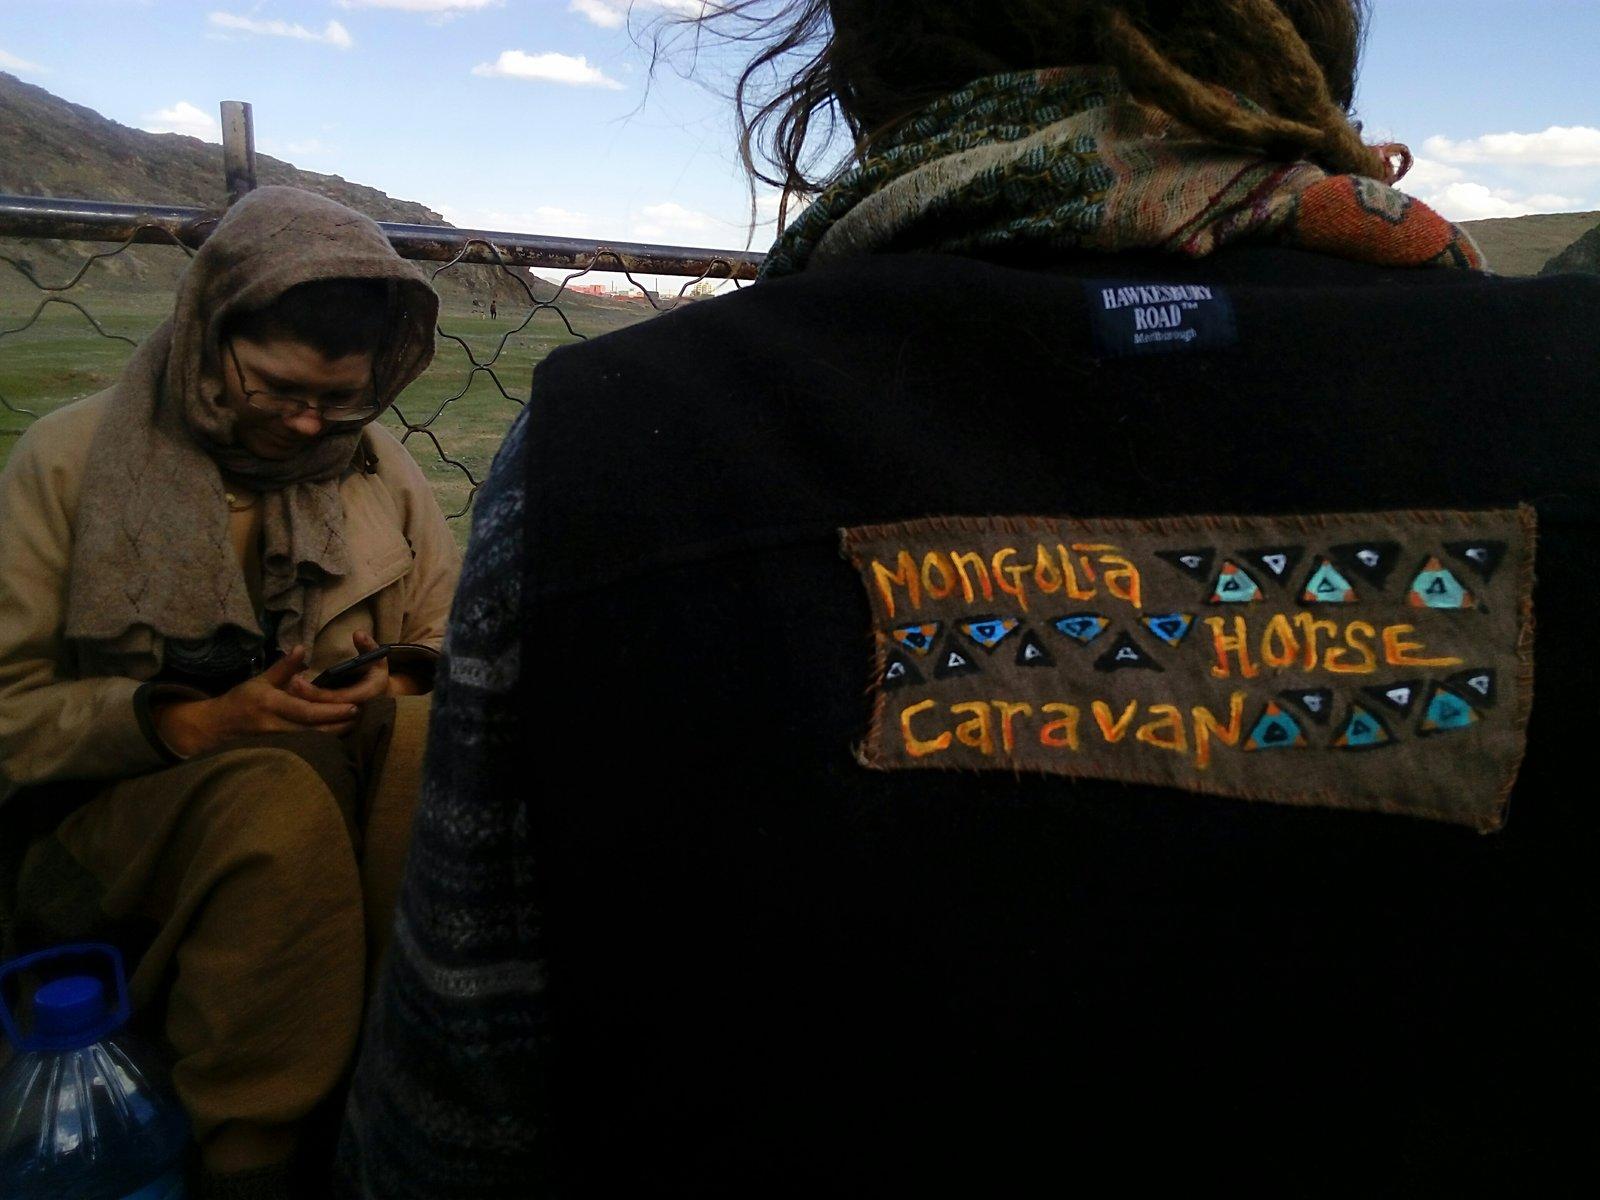 img_20160607_015148-jpg.32469_Mongolia Rainbow Horse Caravan_Travel Stories_Squat the Planet_10:46 PM